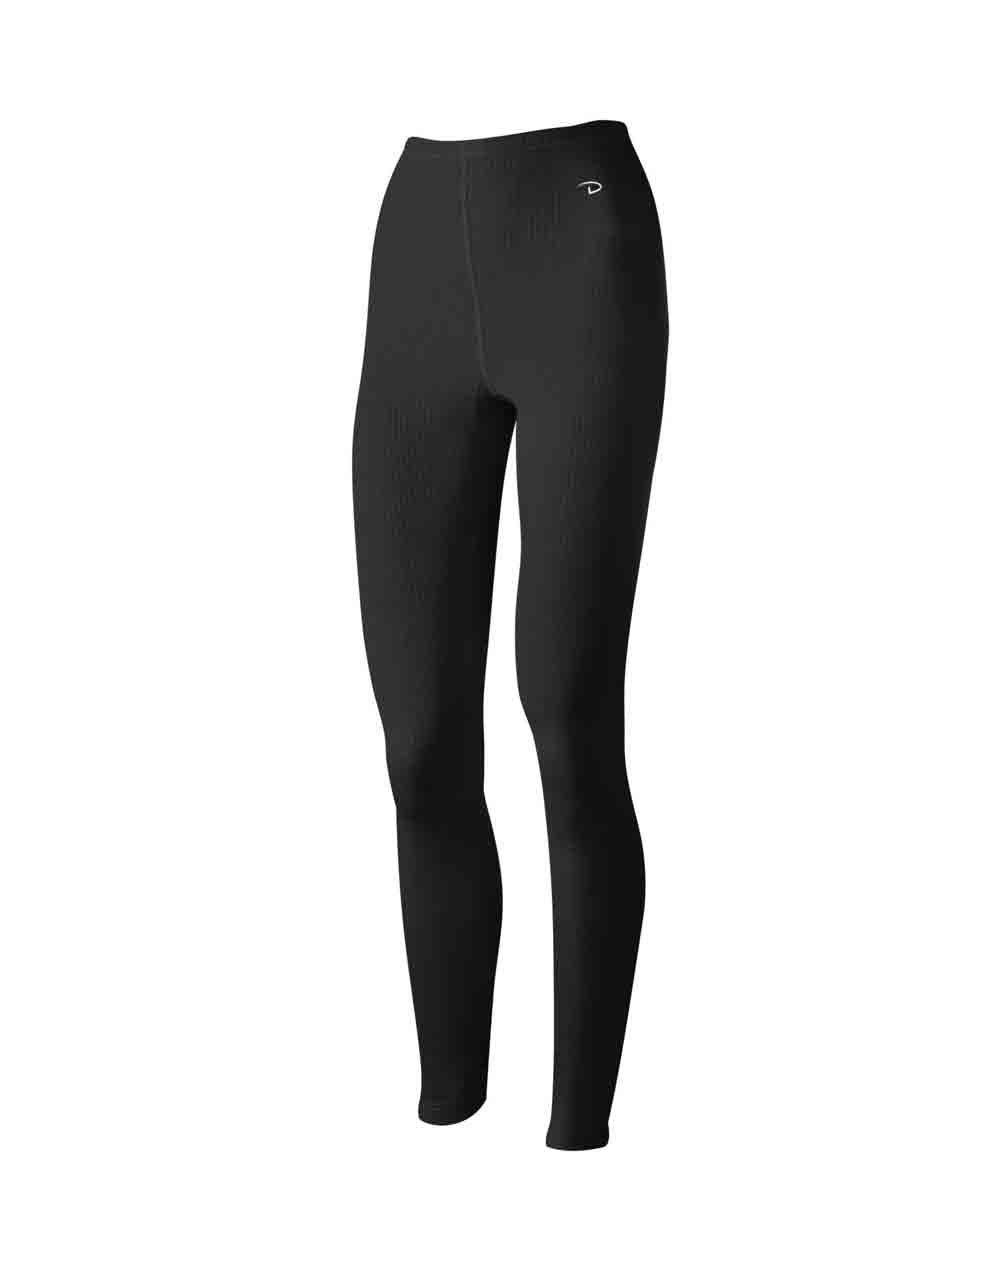 Duofold Women's Mid Weight Wicking Thermal Leggings, Black, Large